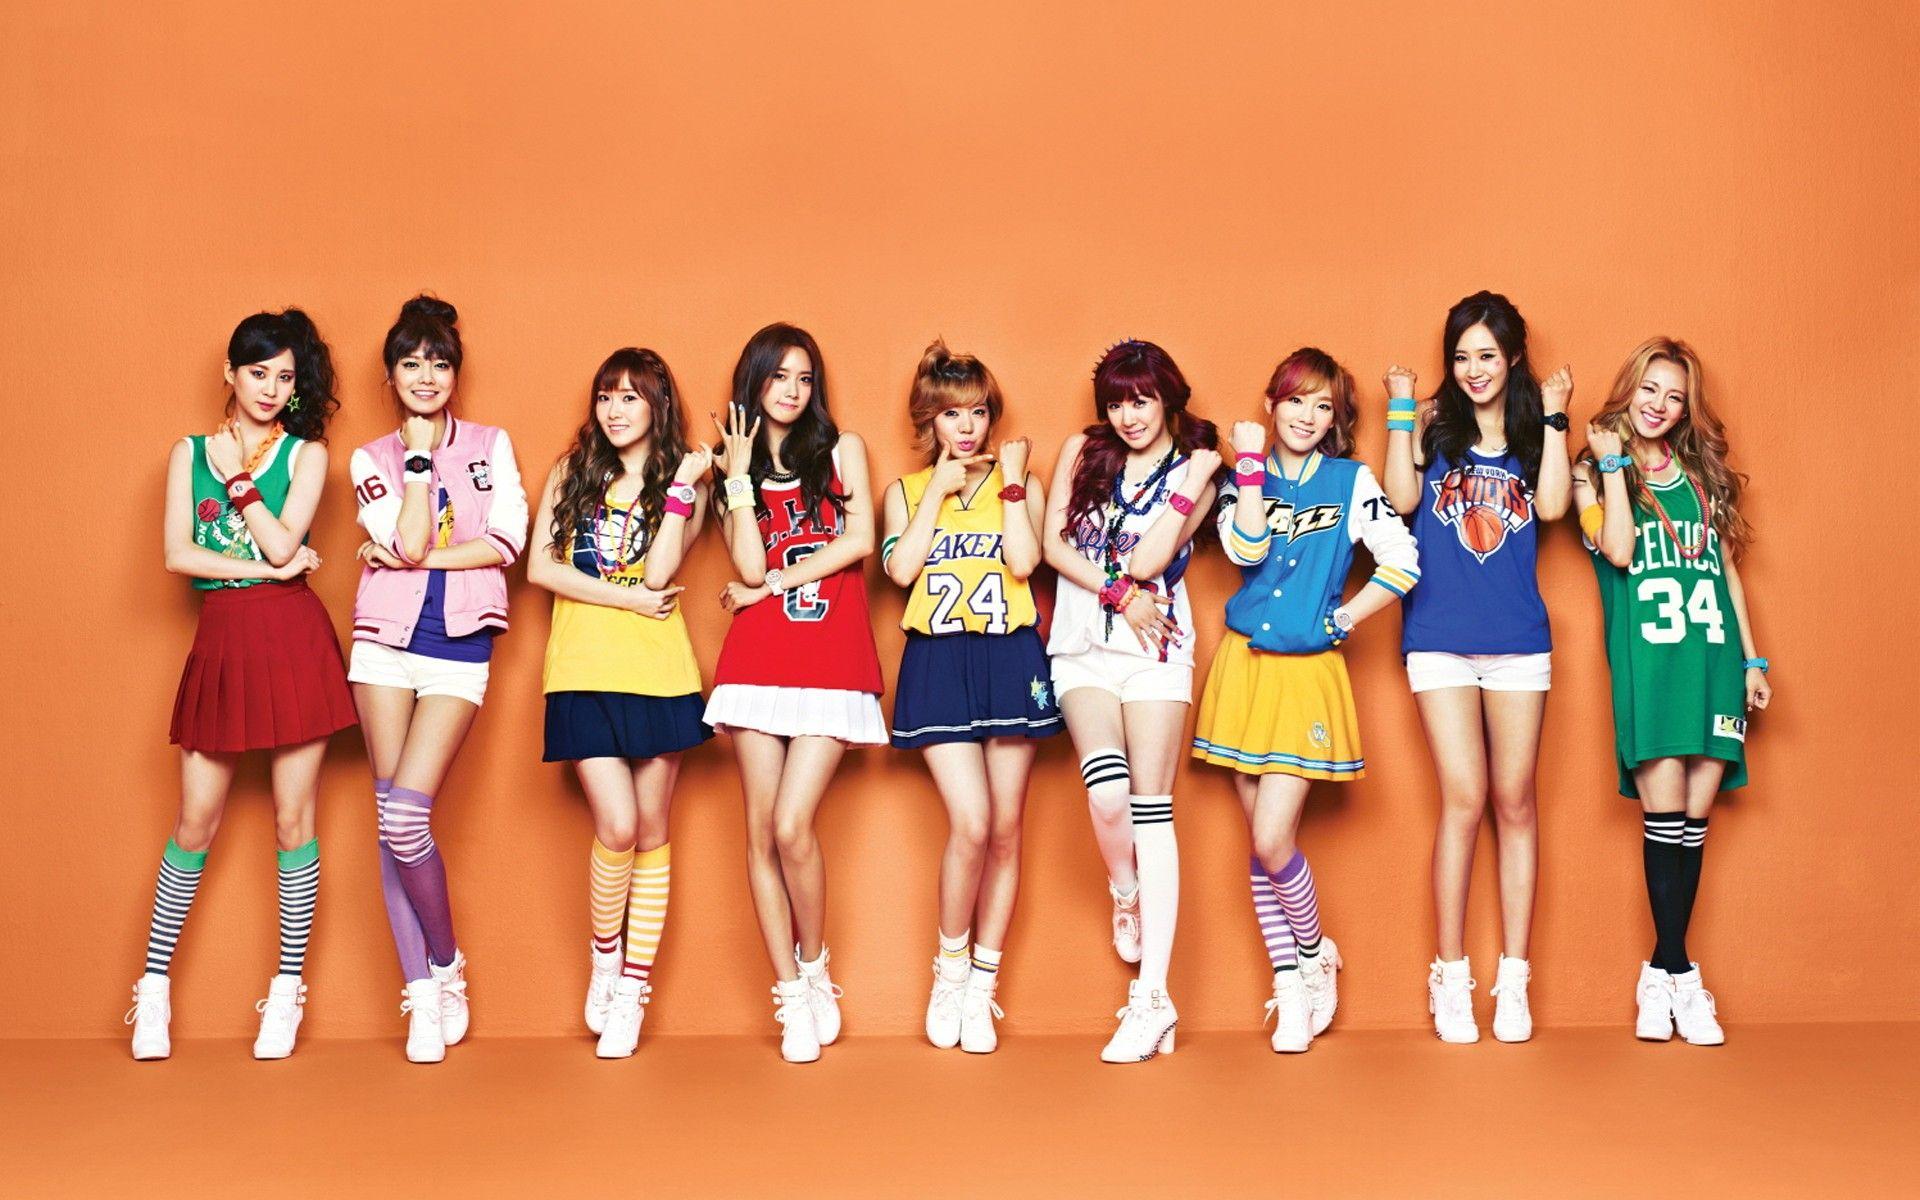 SNSD Girls Generation 2013 Photoshoot